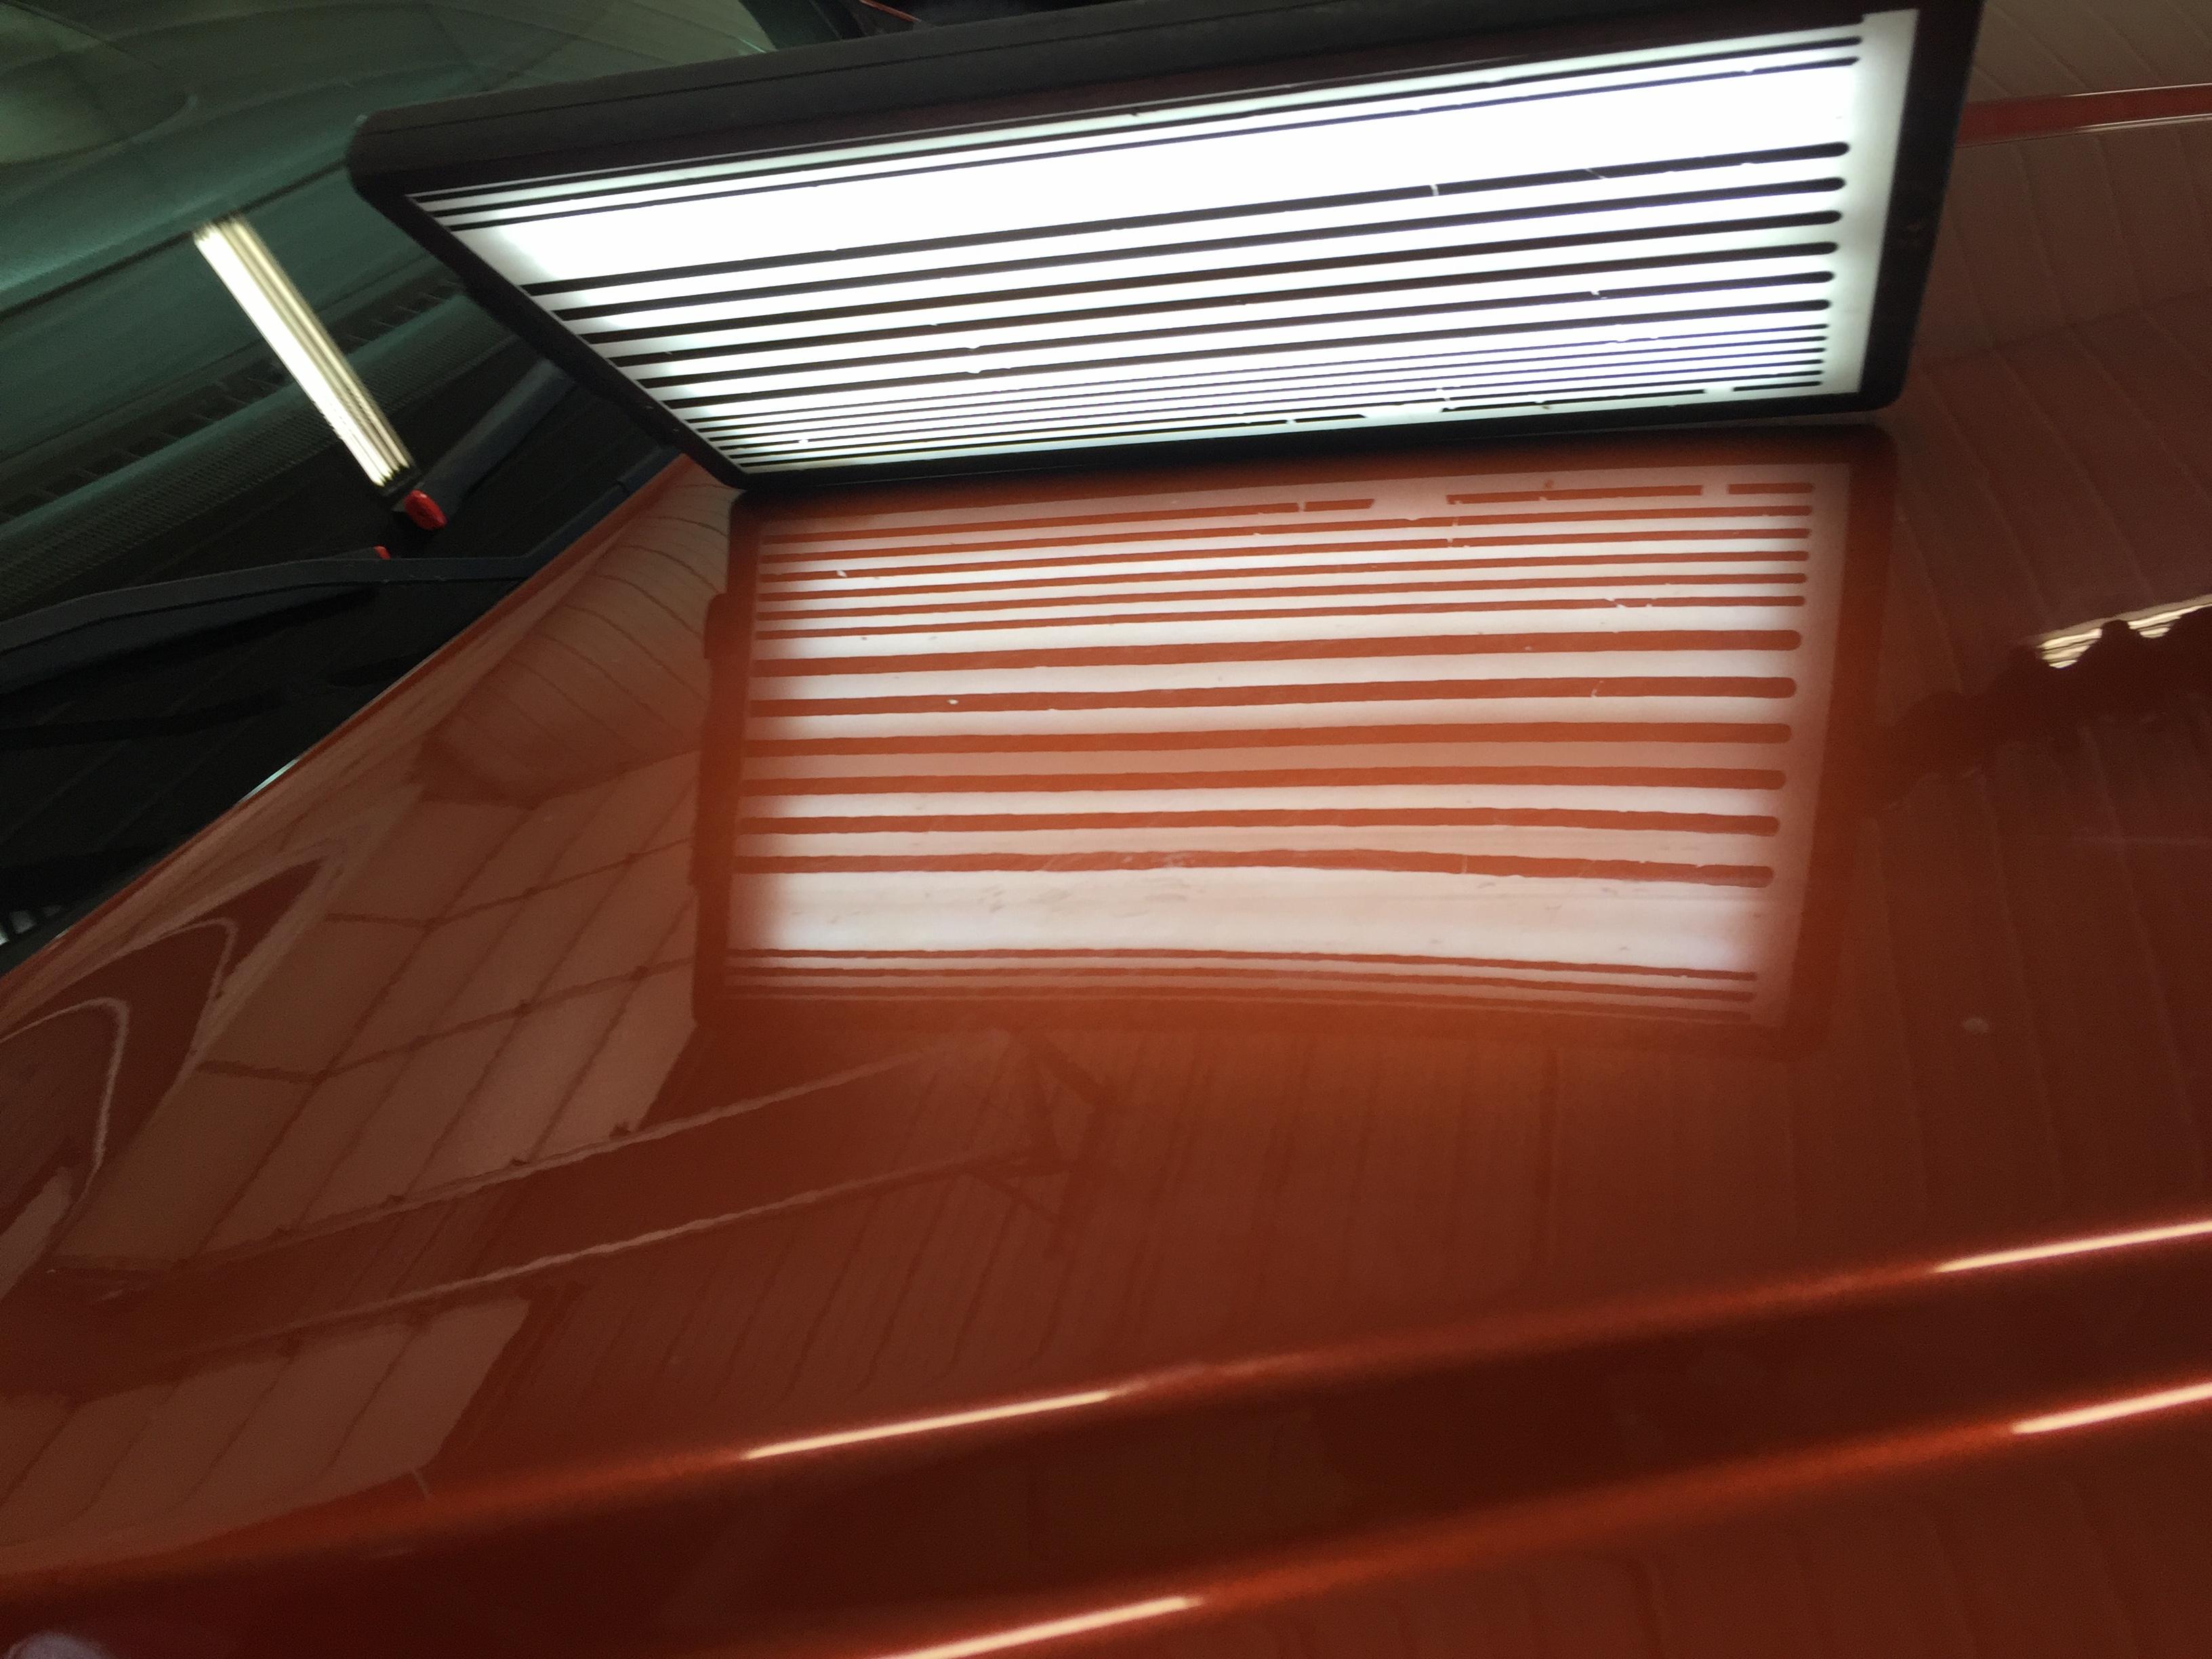 2013 Dodge Journey, Large Crease in Hood, Mobile Dent Repair Springfield, IL http://217dent.com mobile dent repair Decatur IL, Taylorville IL